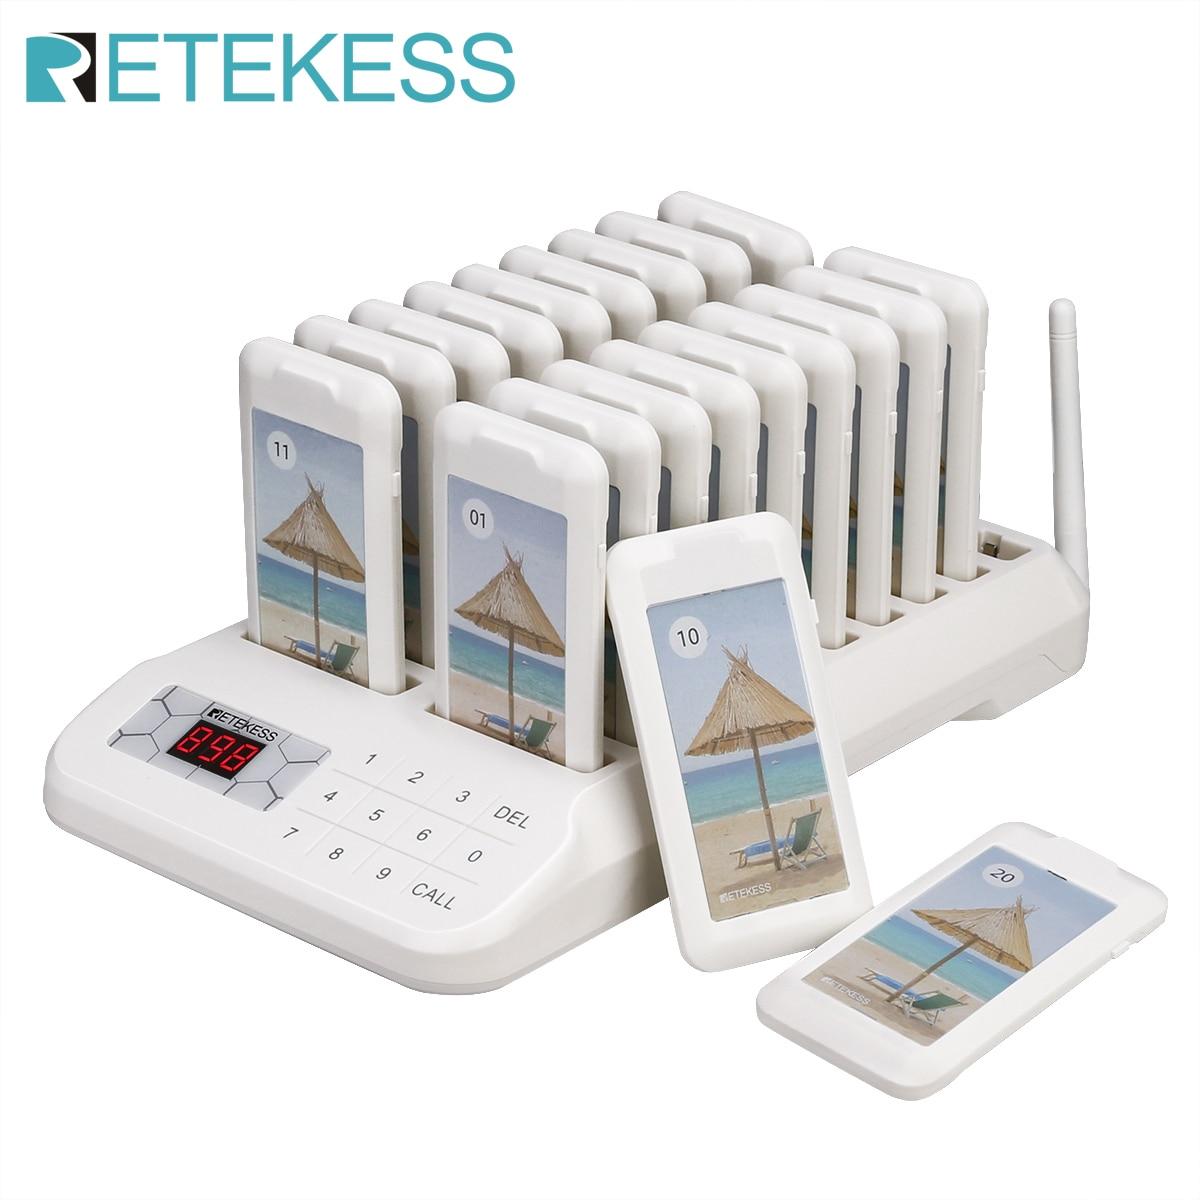 Retekess-TD172 لوحة مفاتيح تعمل باللمس مع 20 جهاز استقبال للمطعم ونظام الاتصال اللاسلكي للكنيسة والمقهى والمستشفى